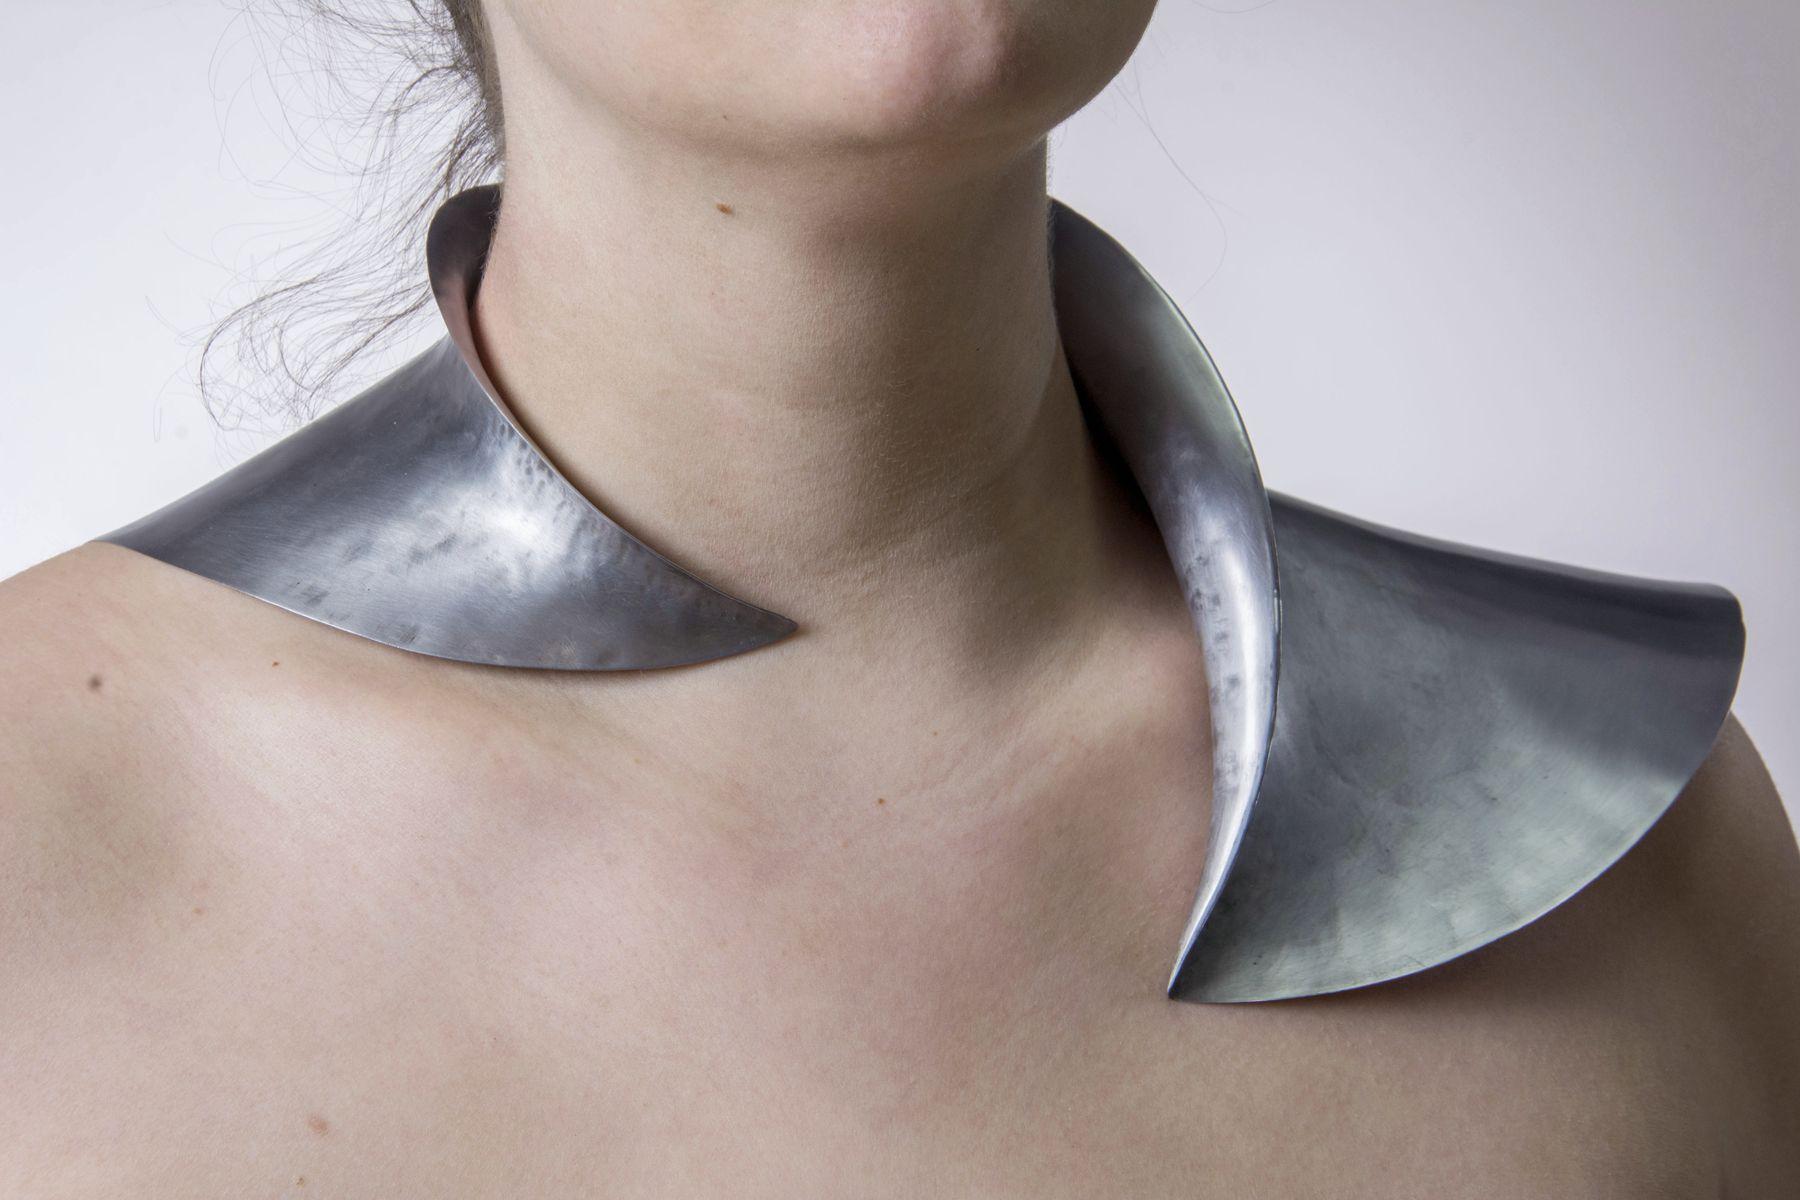 Strength - Anna Koplik - Jewelry BFA Pratt School of Art 2016  Specialisms: Jewellery / Silversmithing / Fine Art / Design New York, United States